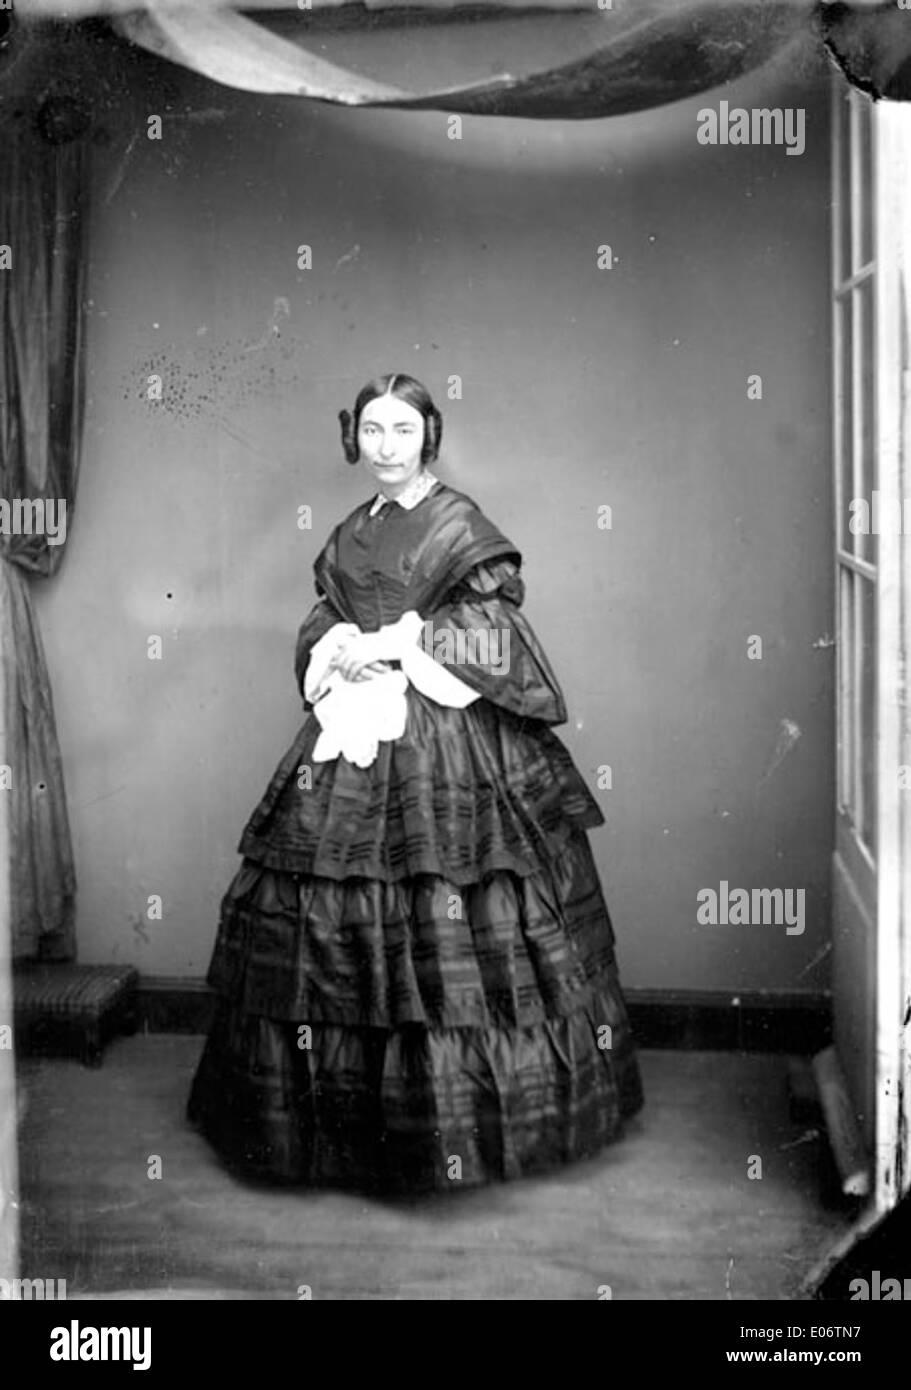 madame chastagnier, atelier vidal, vers 1860 stock photo: 68992595